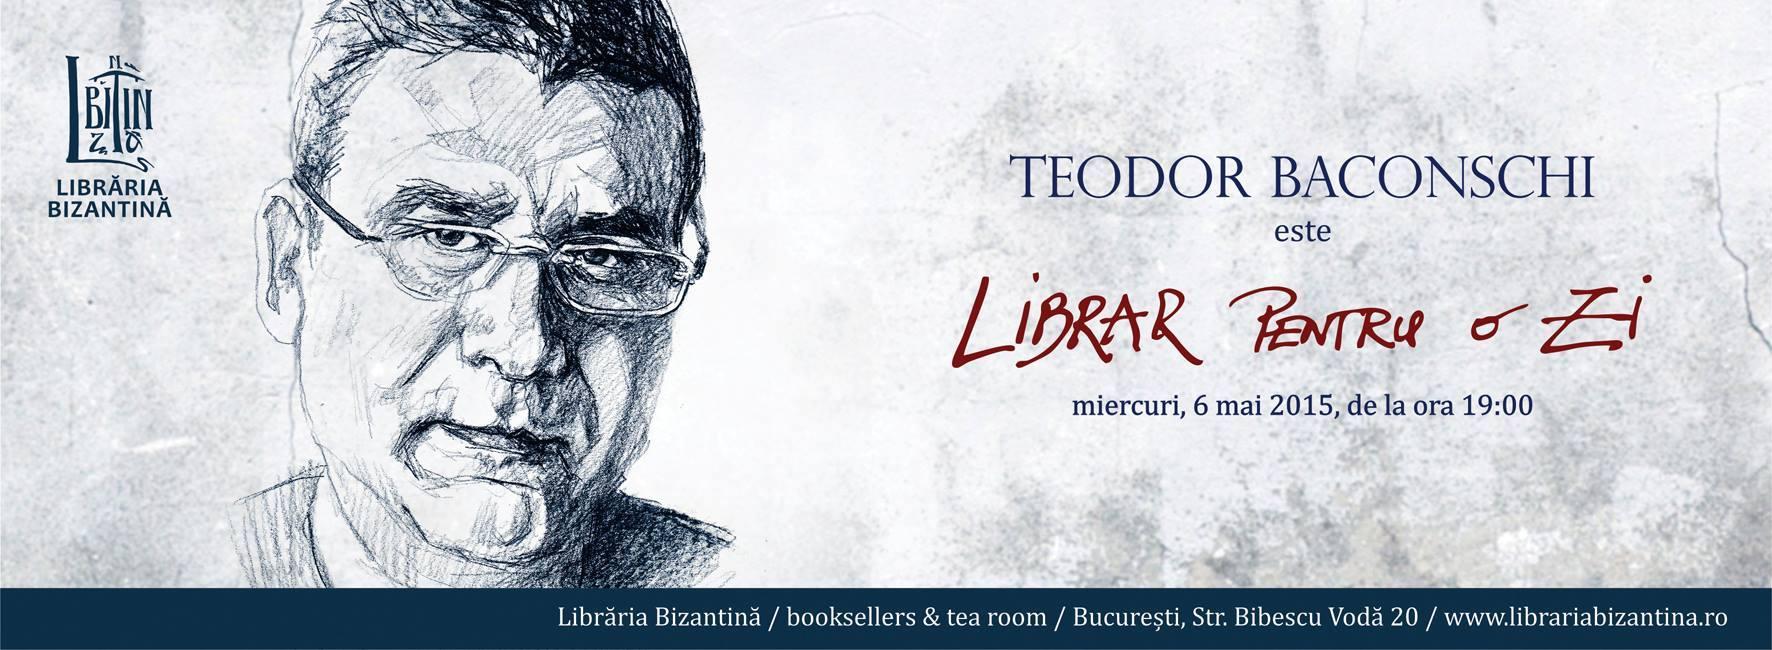 Librar pentru o zi este Teodor Baconschi